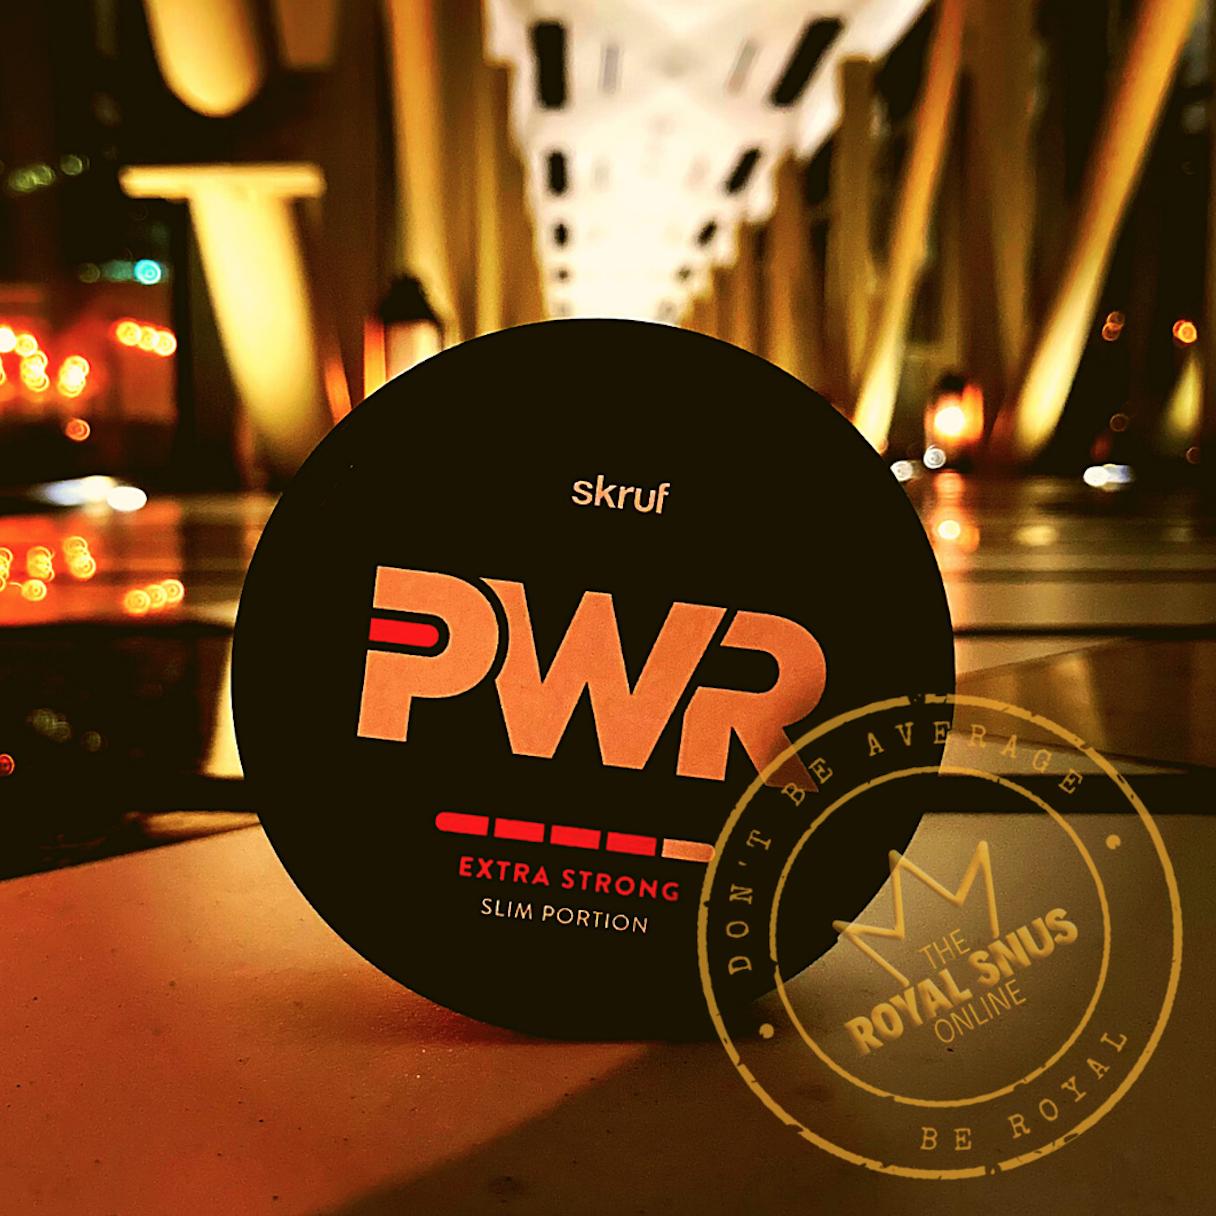 Skruf PWR Extra Strong Slim Portion